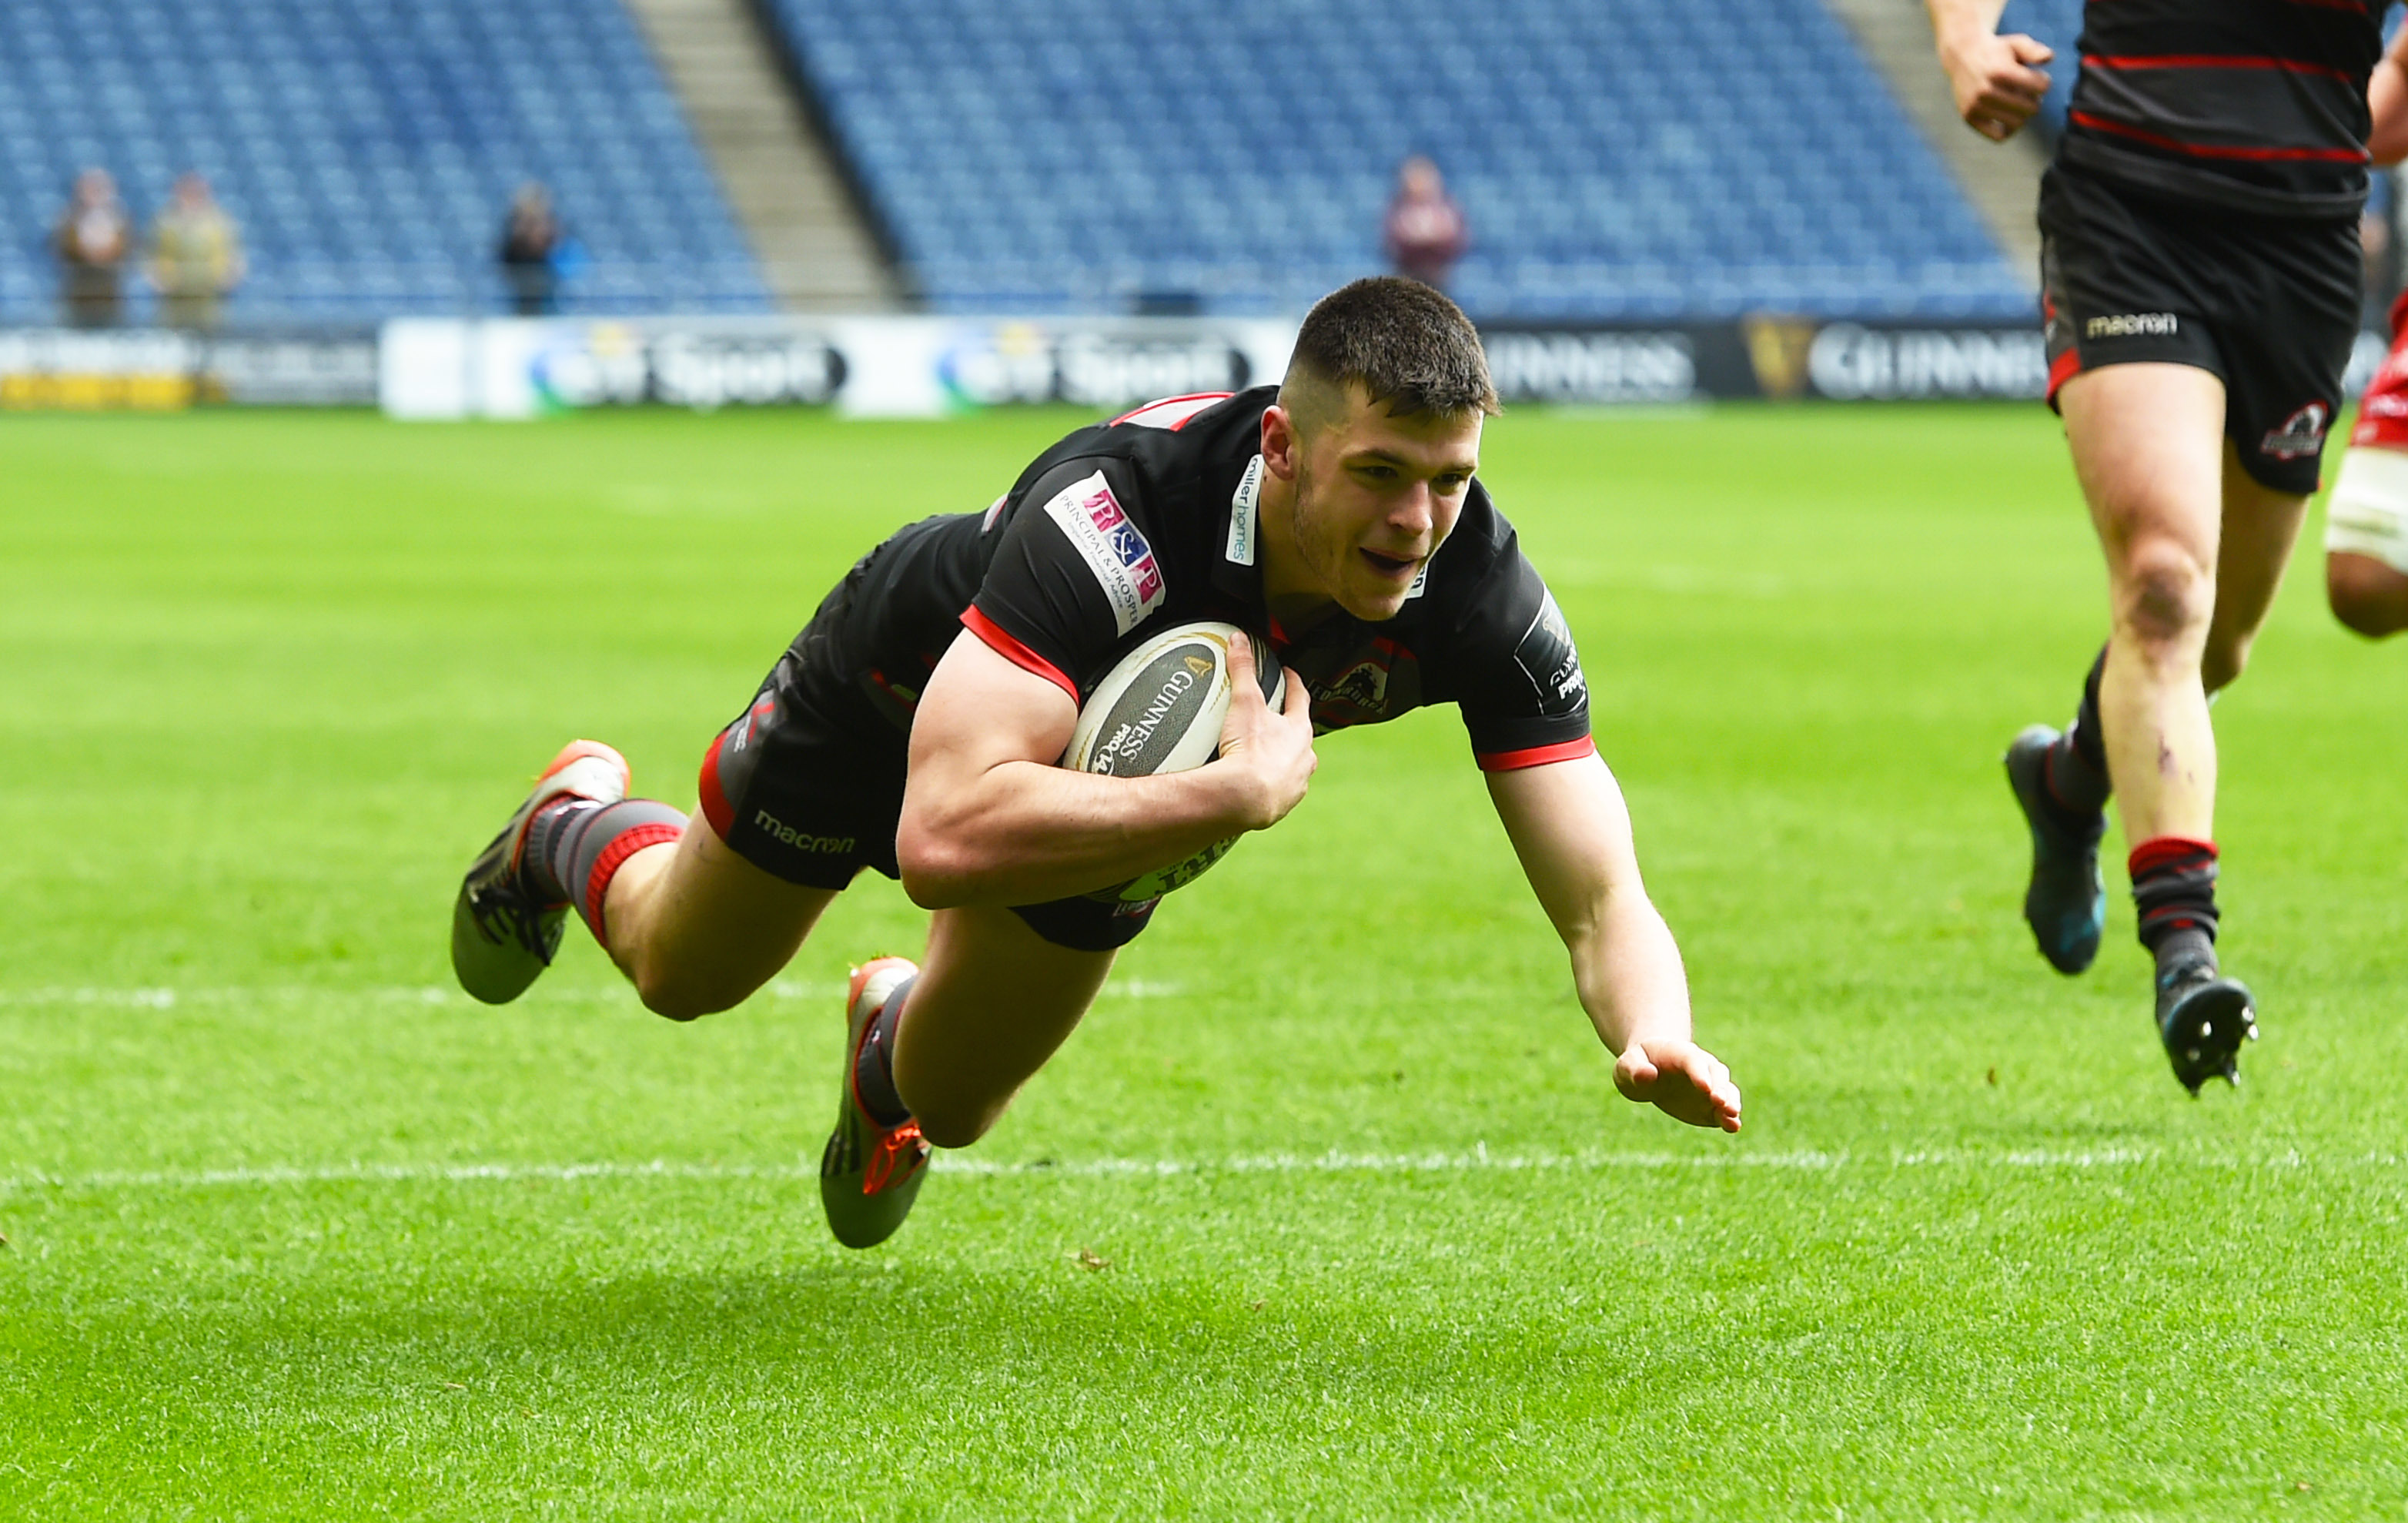 Blair Kinghorn scored the crucial bonus point try for Edinburgh against Newcastle.